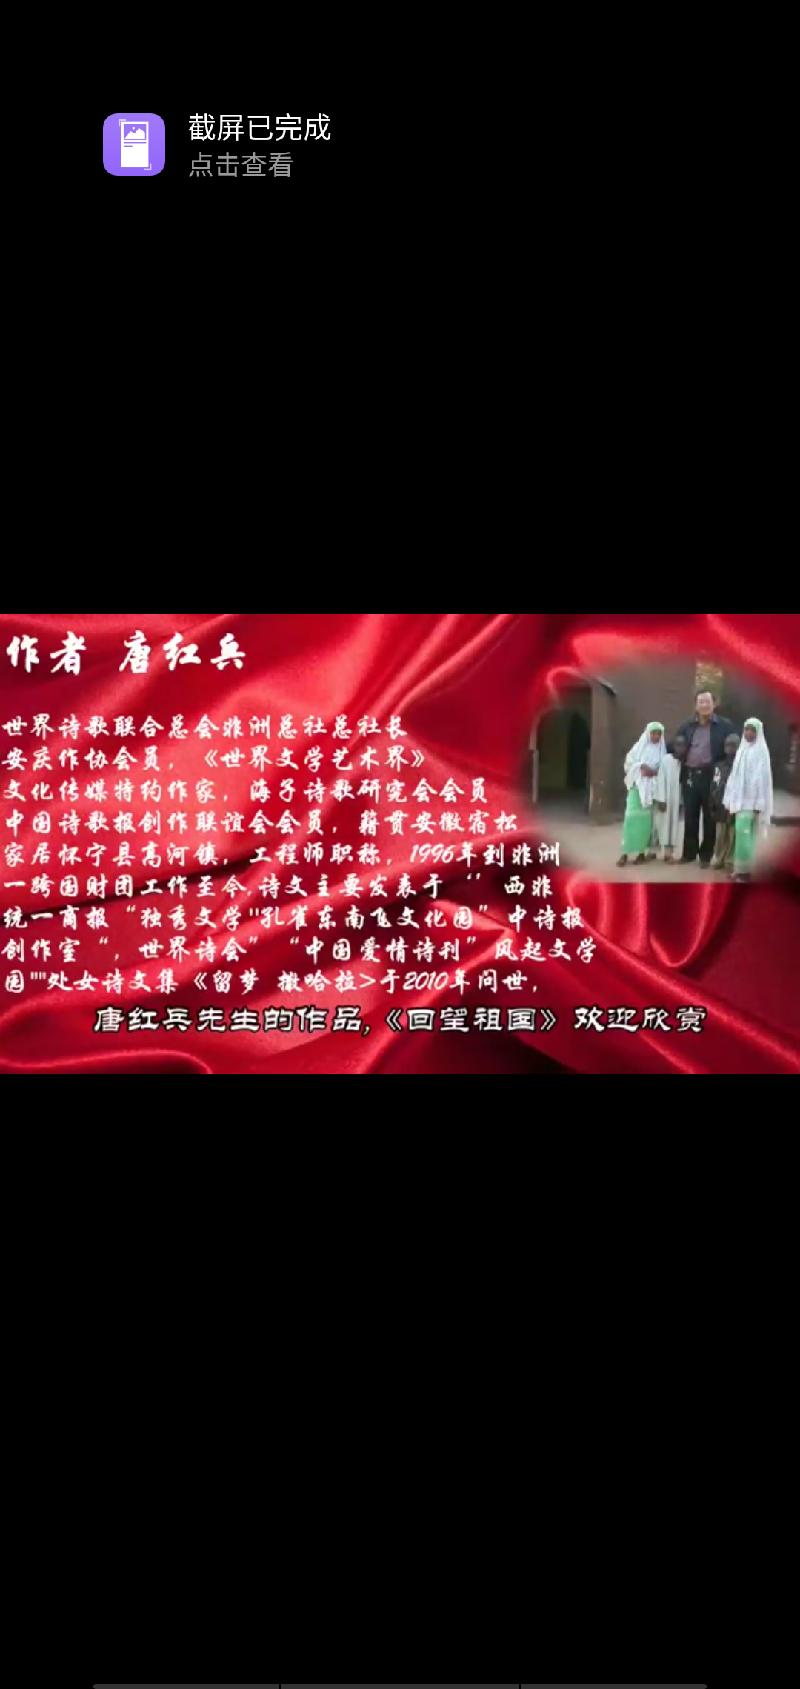 Screenshot_2020-01-15-11-39-20-23